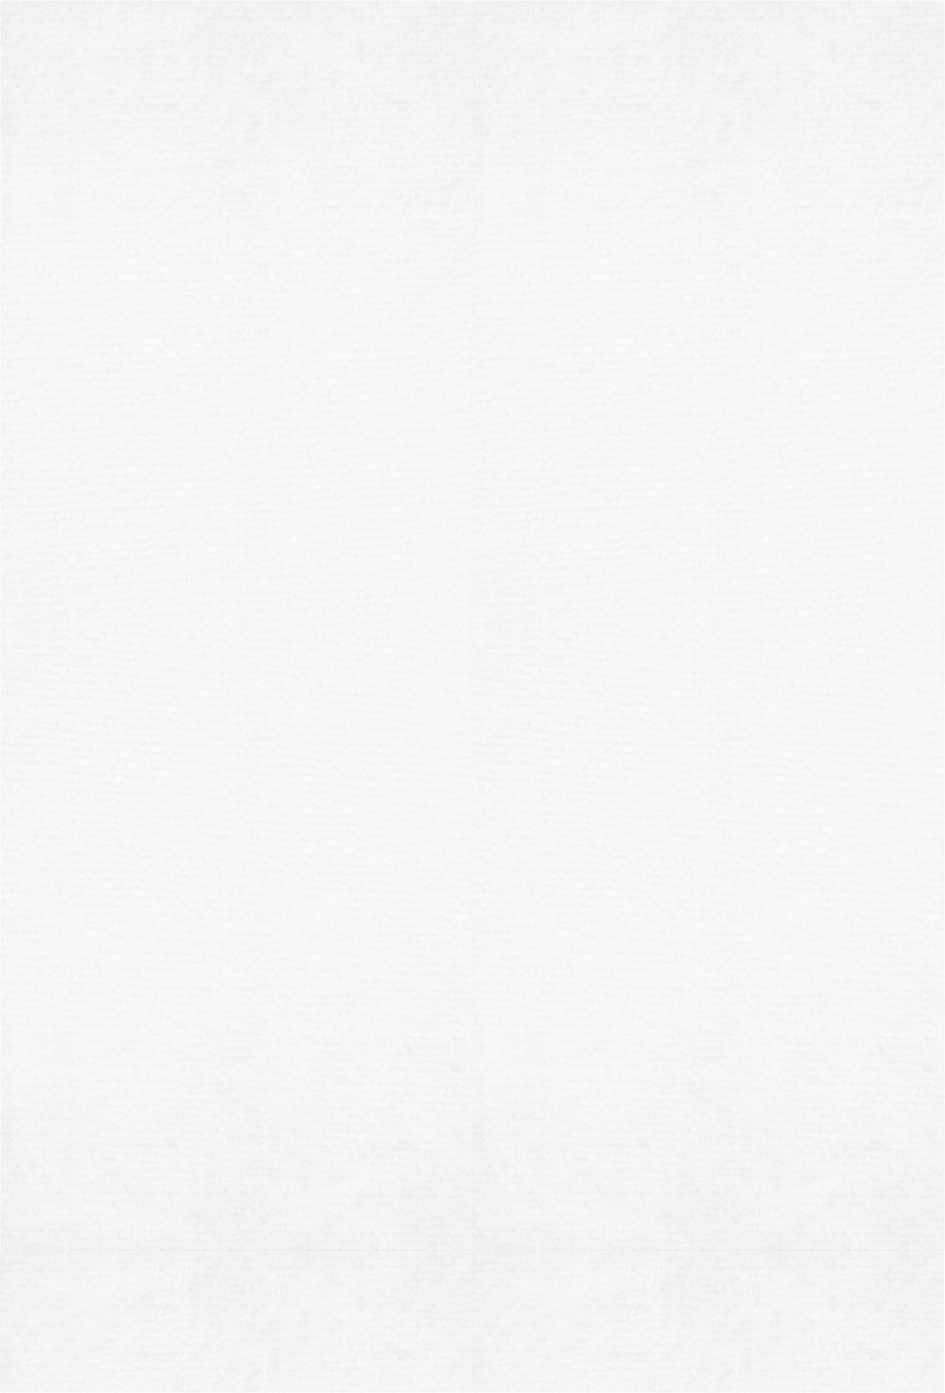 Logofólio-10.png